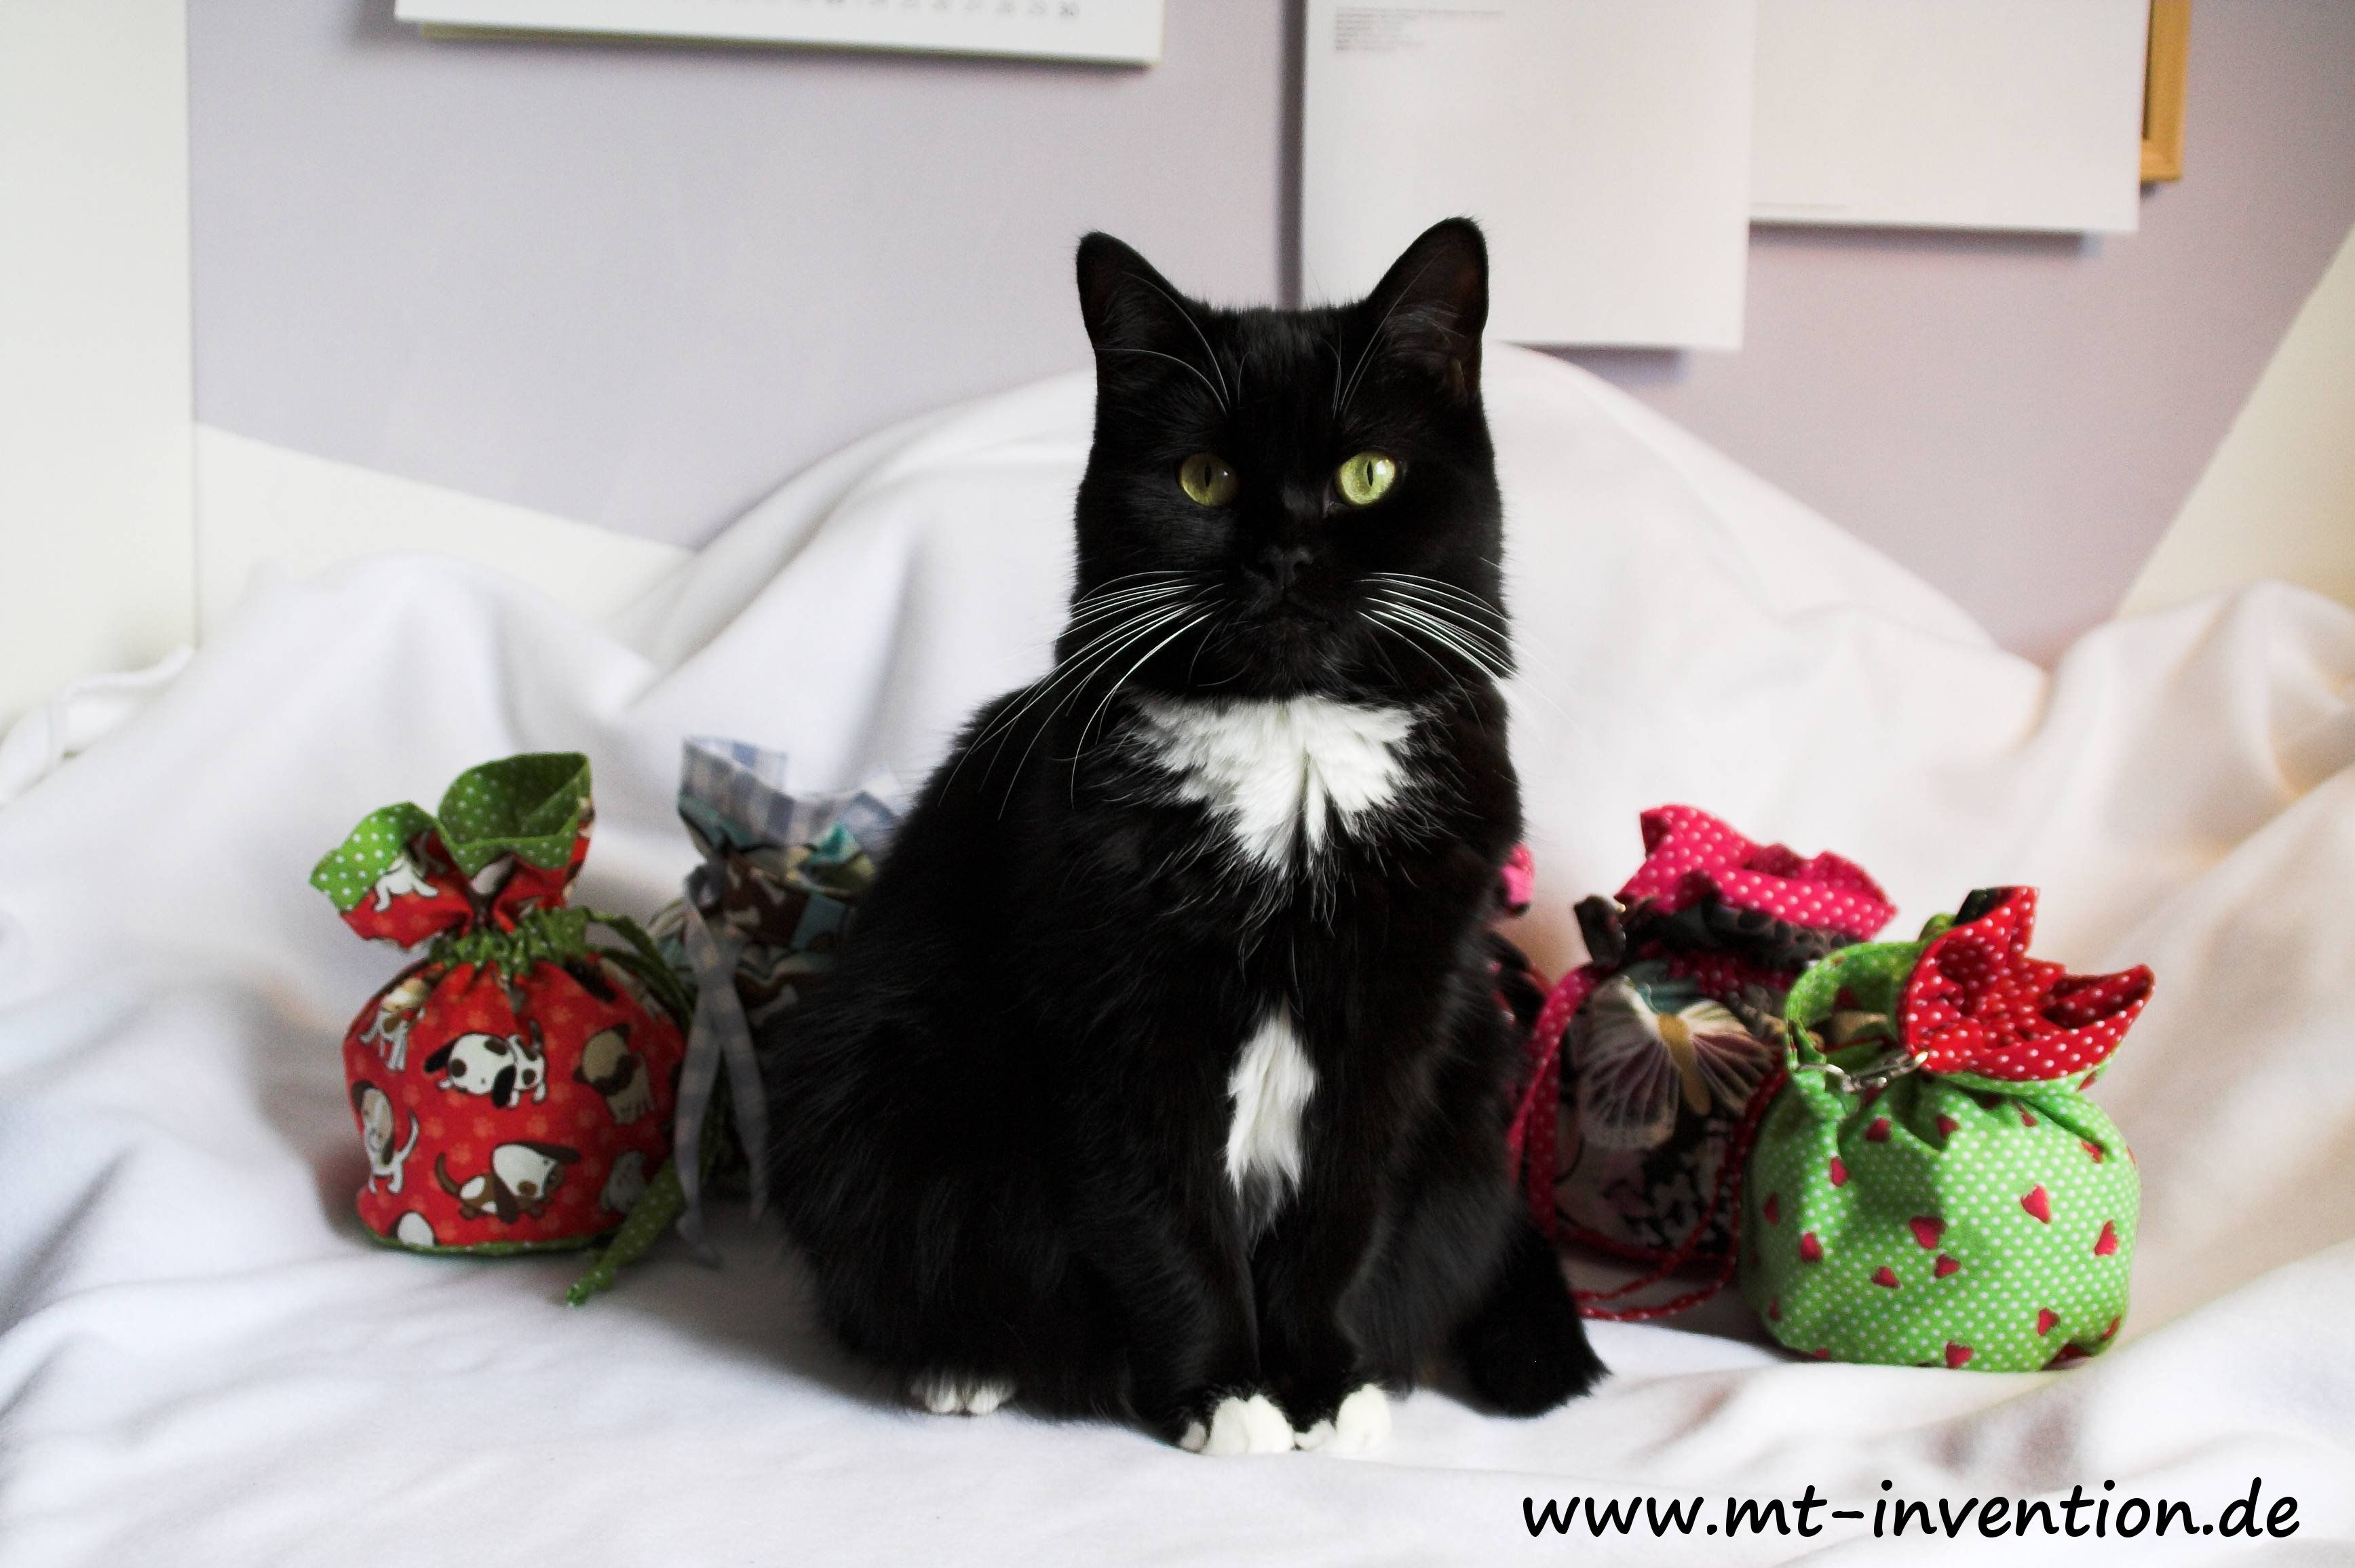 Mausi the cat